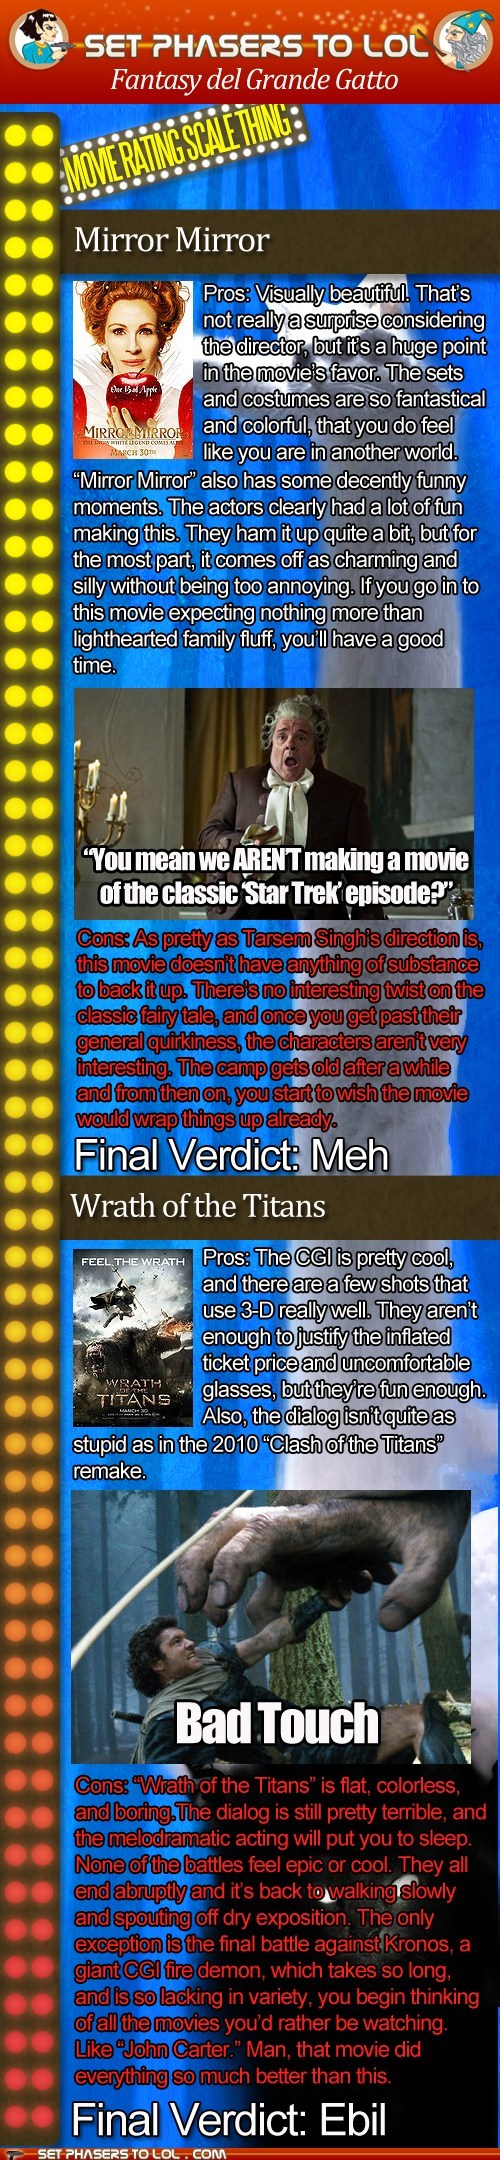 cinema clash of the titans grande gatto julia roberts mirror mirror nathan lane News and Reviews review movies Sam Worthington snow white wrath of the titans - 6049707008